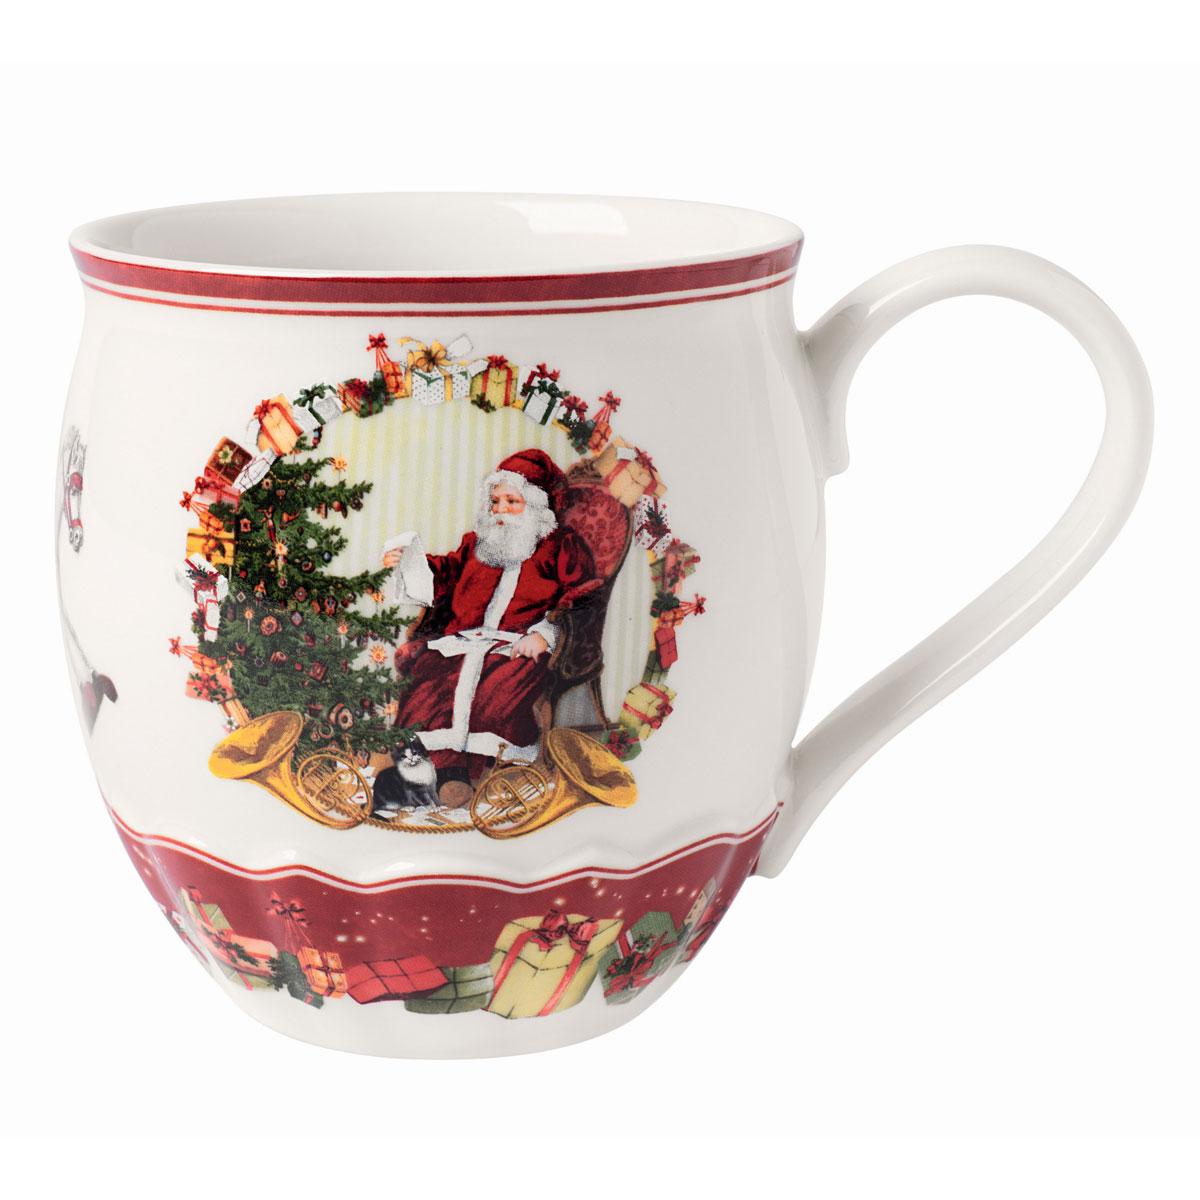 Villeroy and Boch Toys Fantasy Jumbo Mug, Santa